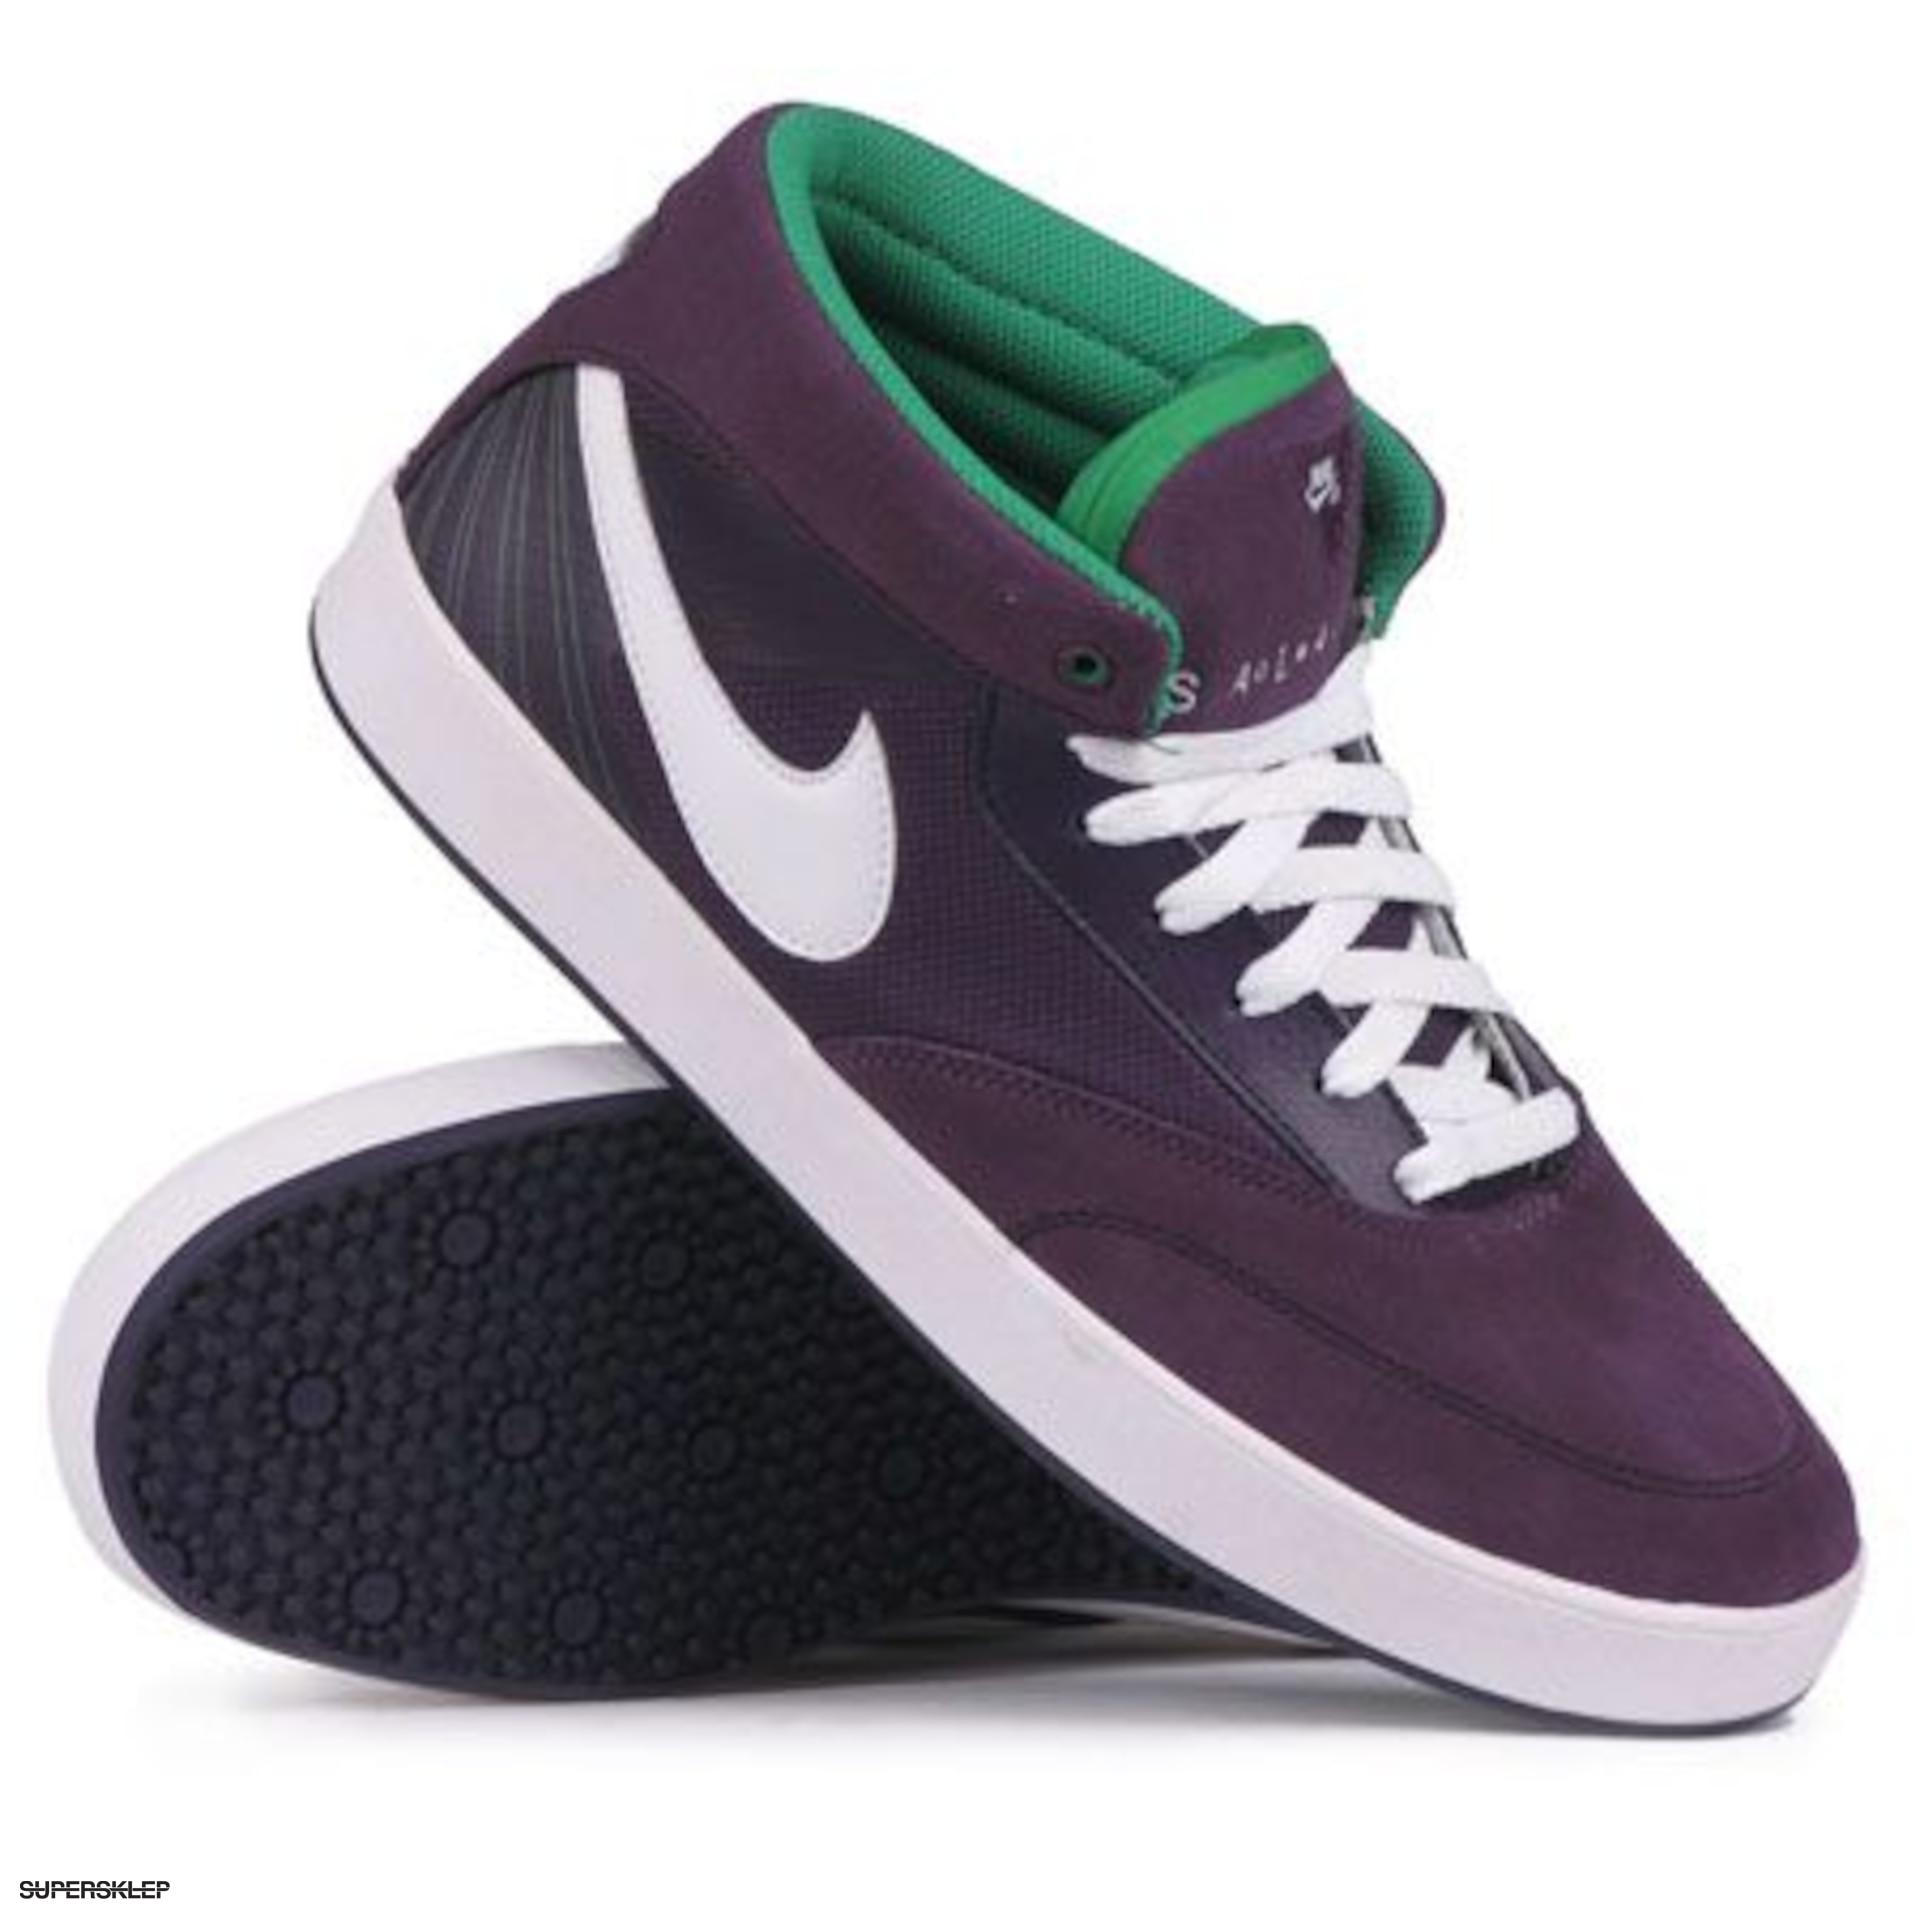 promo code d8f4d efda1 Buty Nike SB Zoom Omar Salazar (grand purplewhite-lucky gree